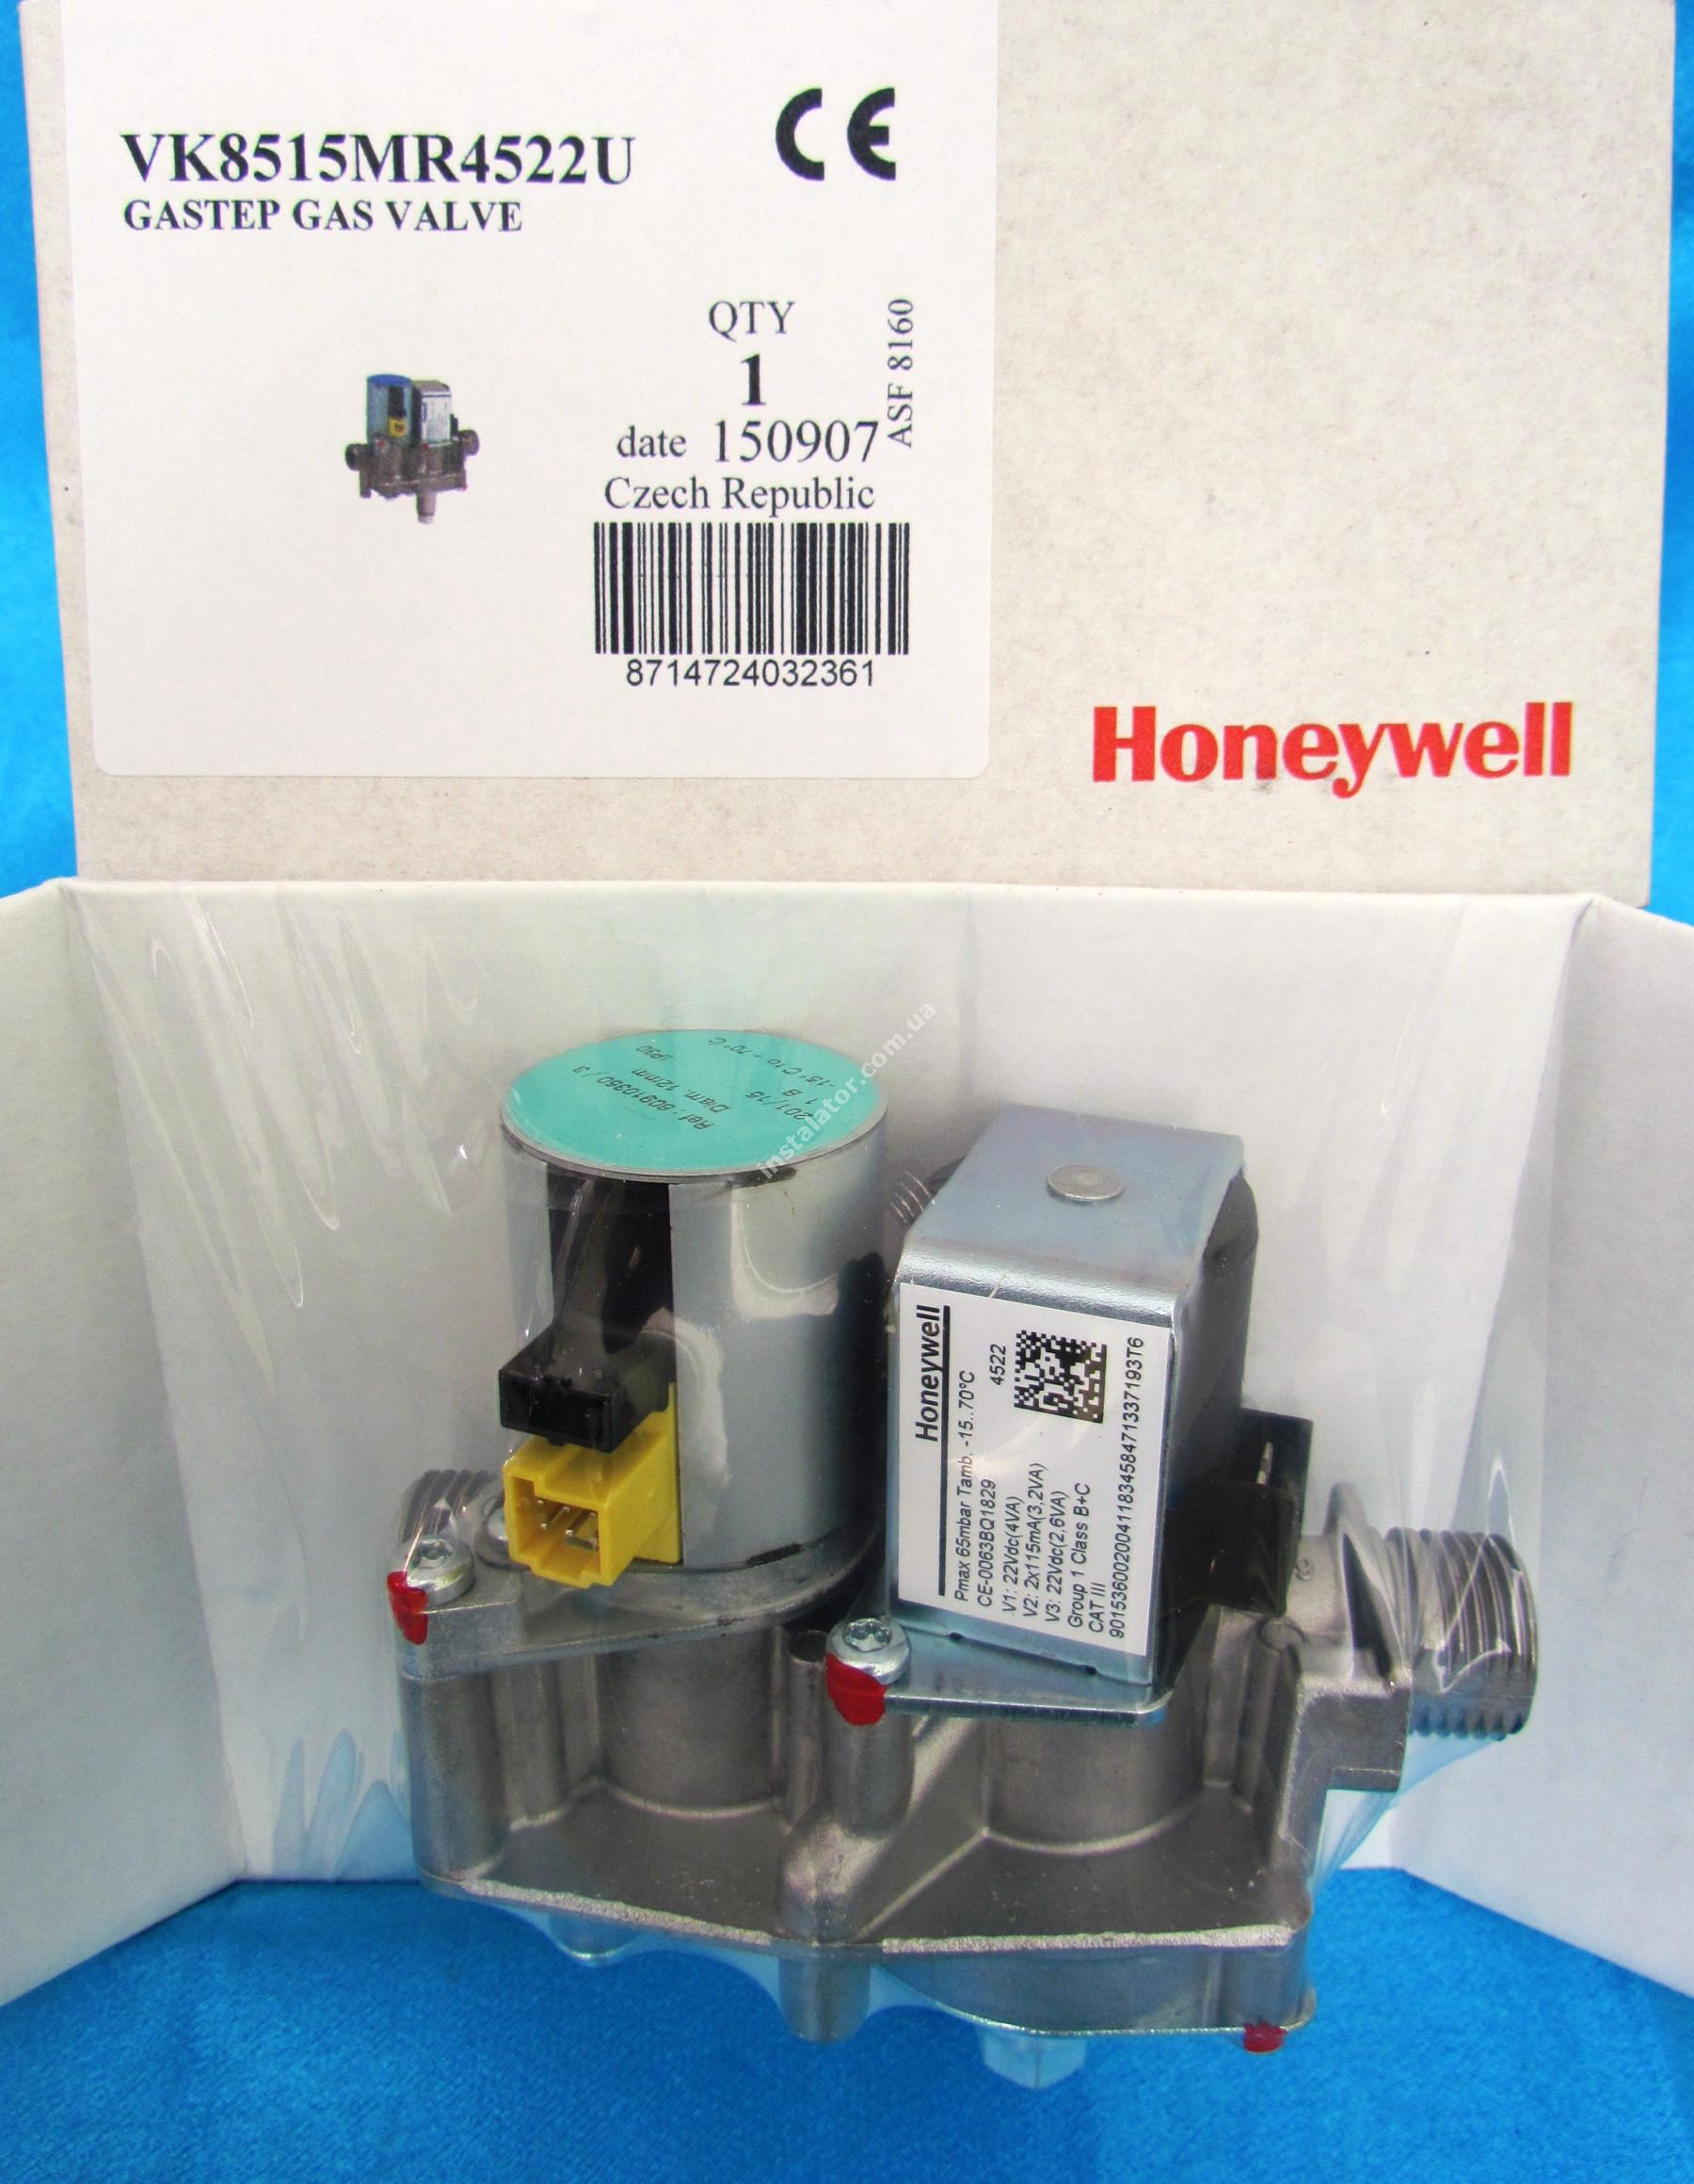 0020053968/0020049296 Газовий клапан з регулятором PROTHERM/VAILLANT full-image-1